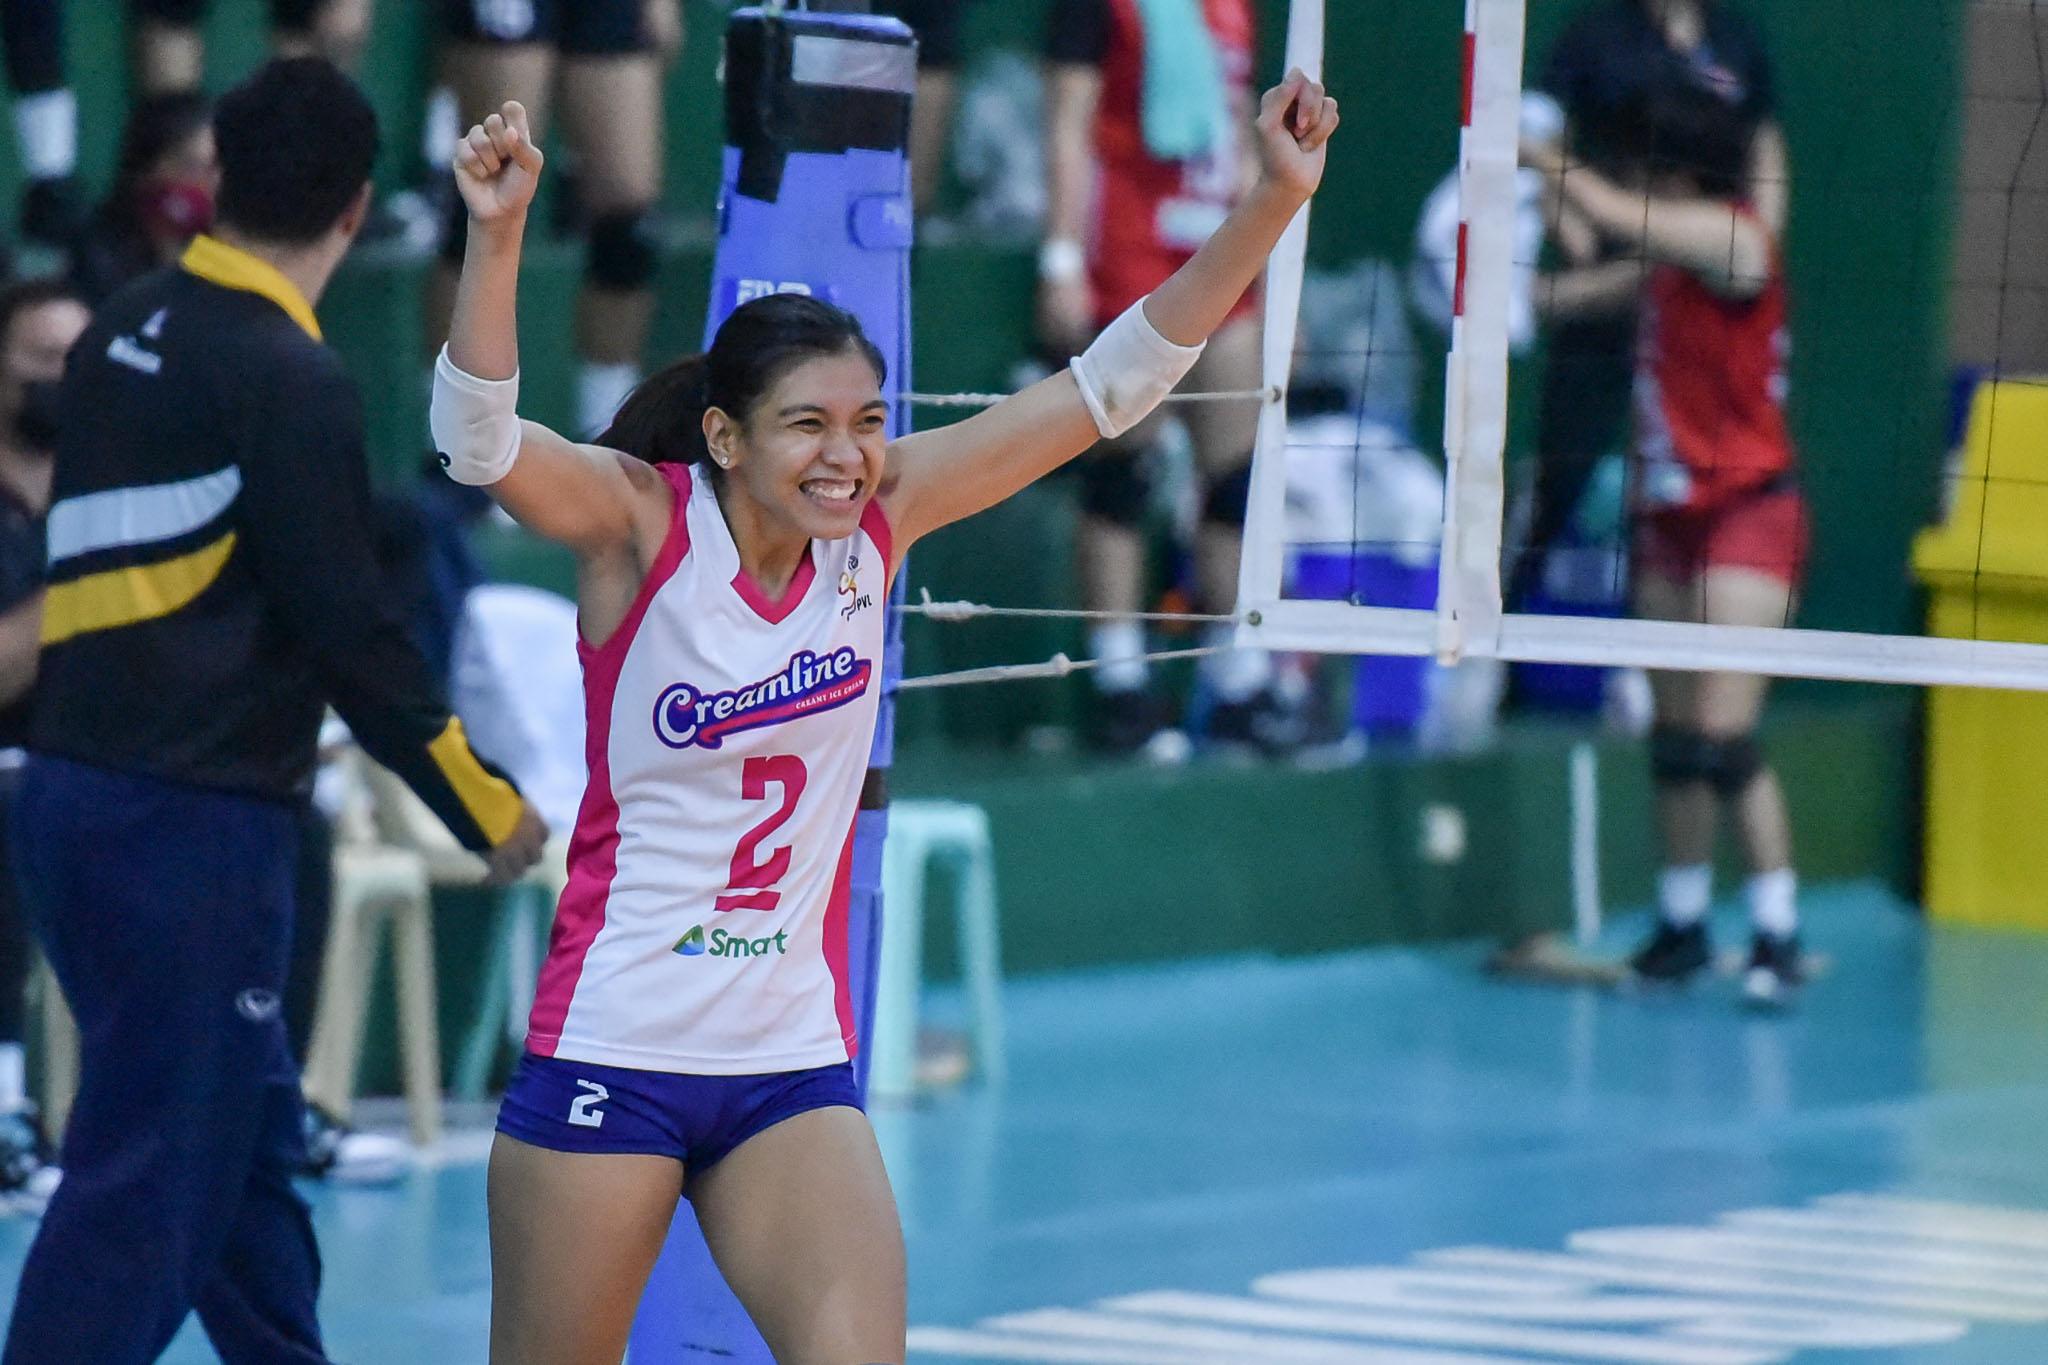 2021-PVL-Open-Chery-Tiggo-vs.-Creamline-Finals-G1-Alyssa-Valdez-5284 Souza de Brito explains decision to not include Valdez, Morado in pool News Volleyball  - philippine sports news